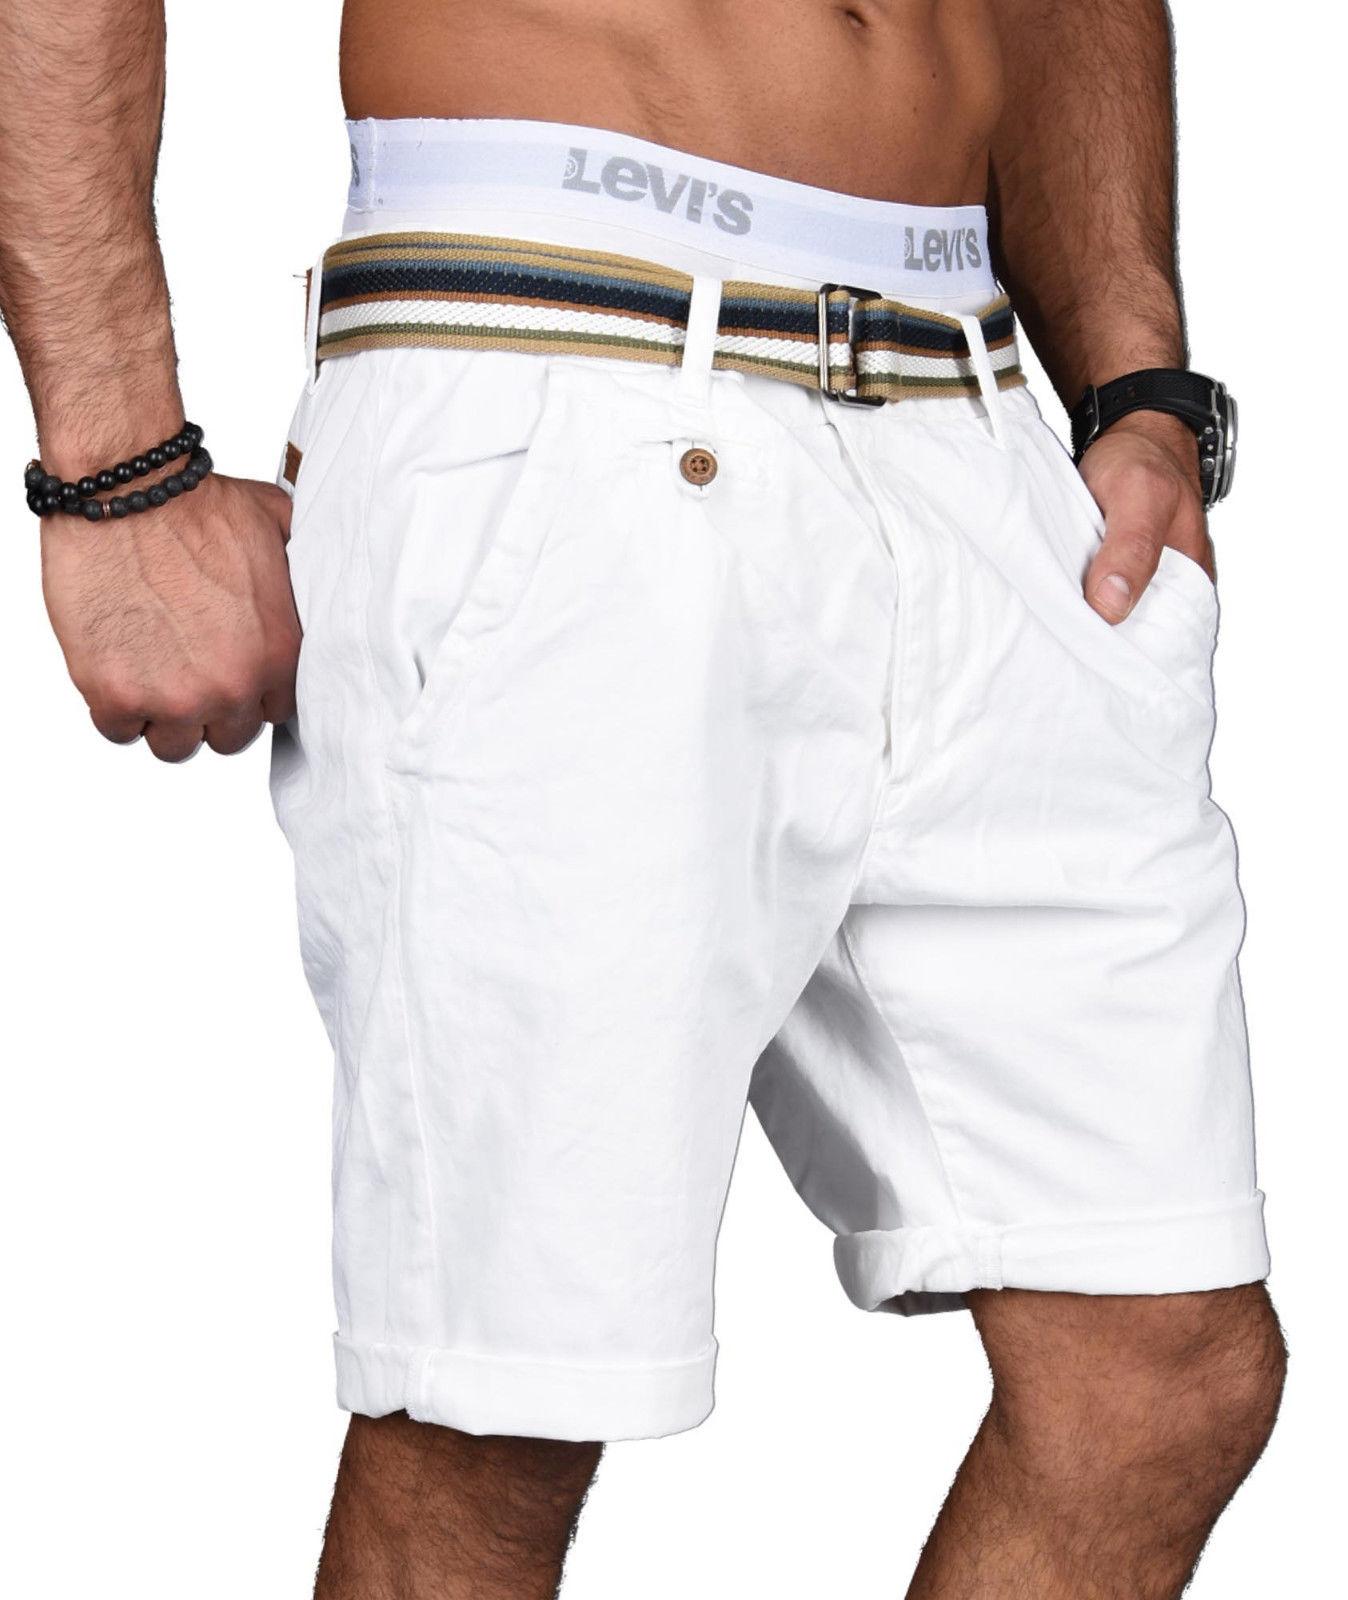 Indicode-Herren-Sommer-Bermuda-Chino-Shorts-kurze-Hose-Sommerhose-Short-NEU-B499 Indexbild 31